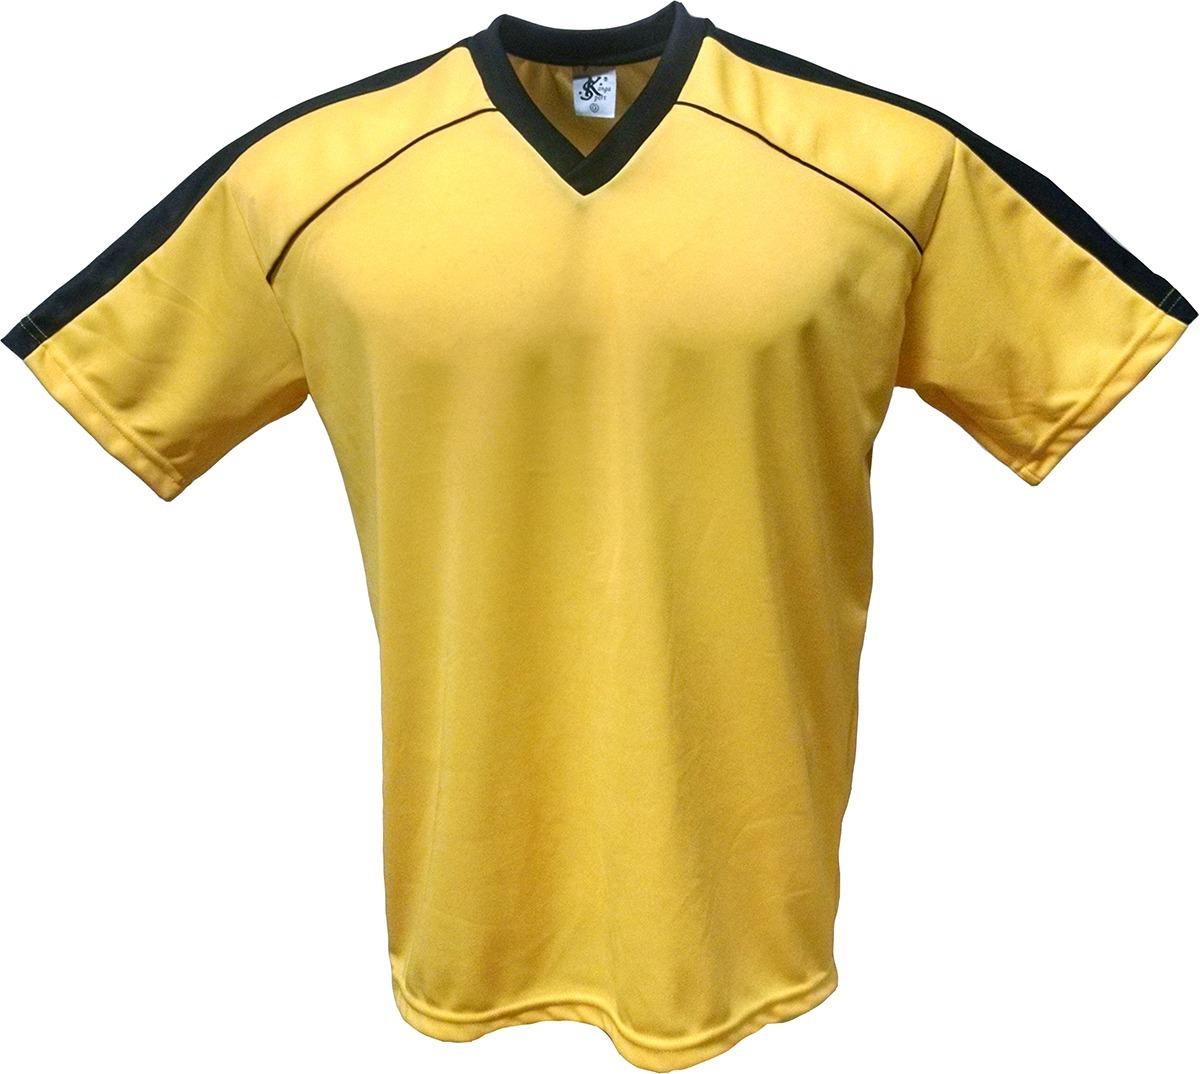 483c6efaa4 Kit 5 Camisa Numerada Fardamento Uniforme Esportivo Futebol - R  148 ...